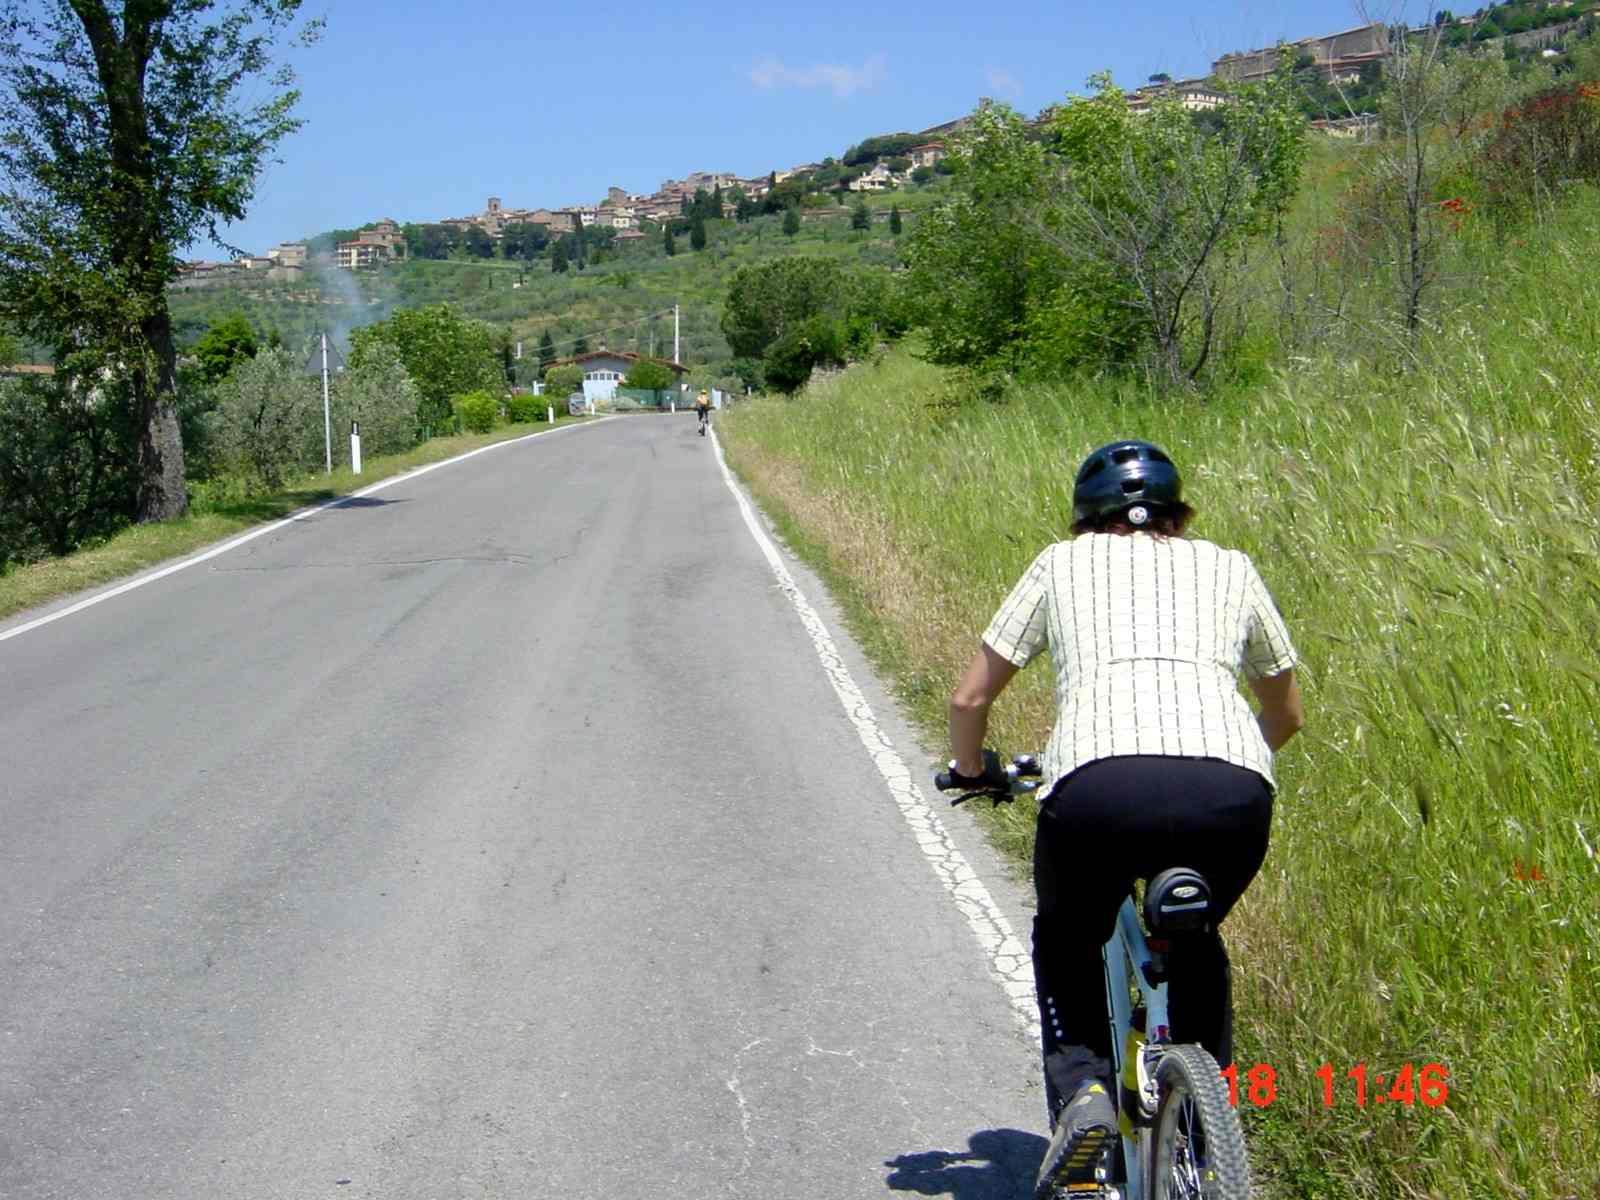 Foto: Manfred Karl / Mountainbike Tour / Monte Ginezzo, 928 m / Vor Cortona / 20.06.2007 06:16:33